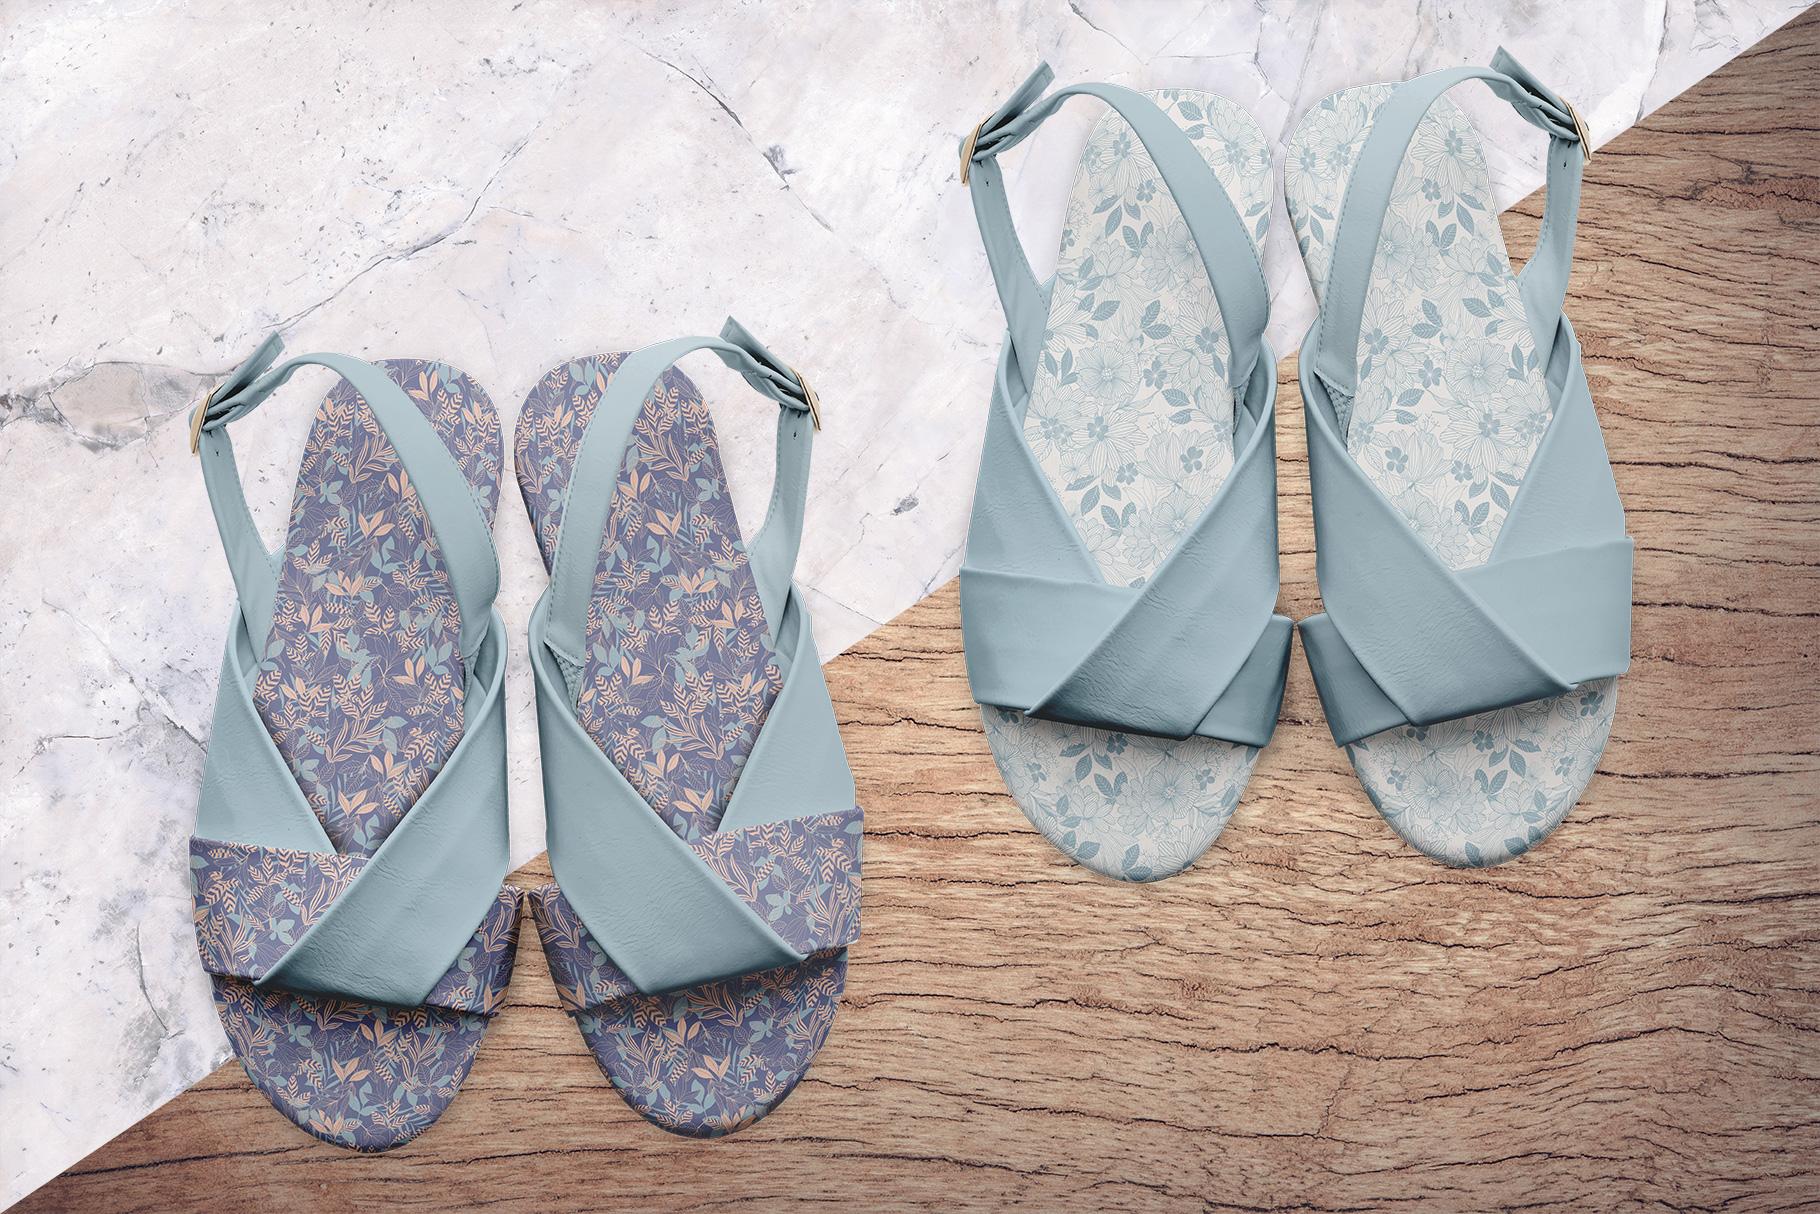 background options of the women's slingback sandal mockup